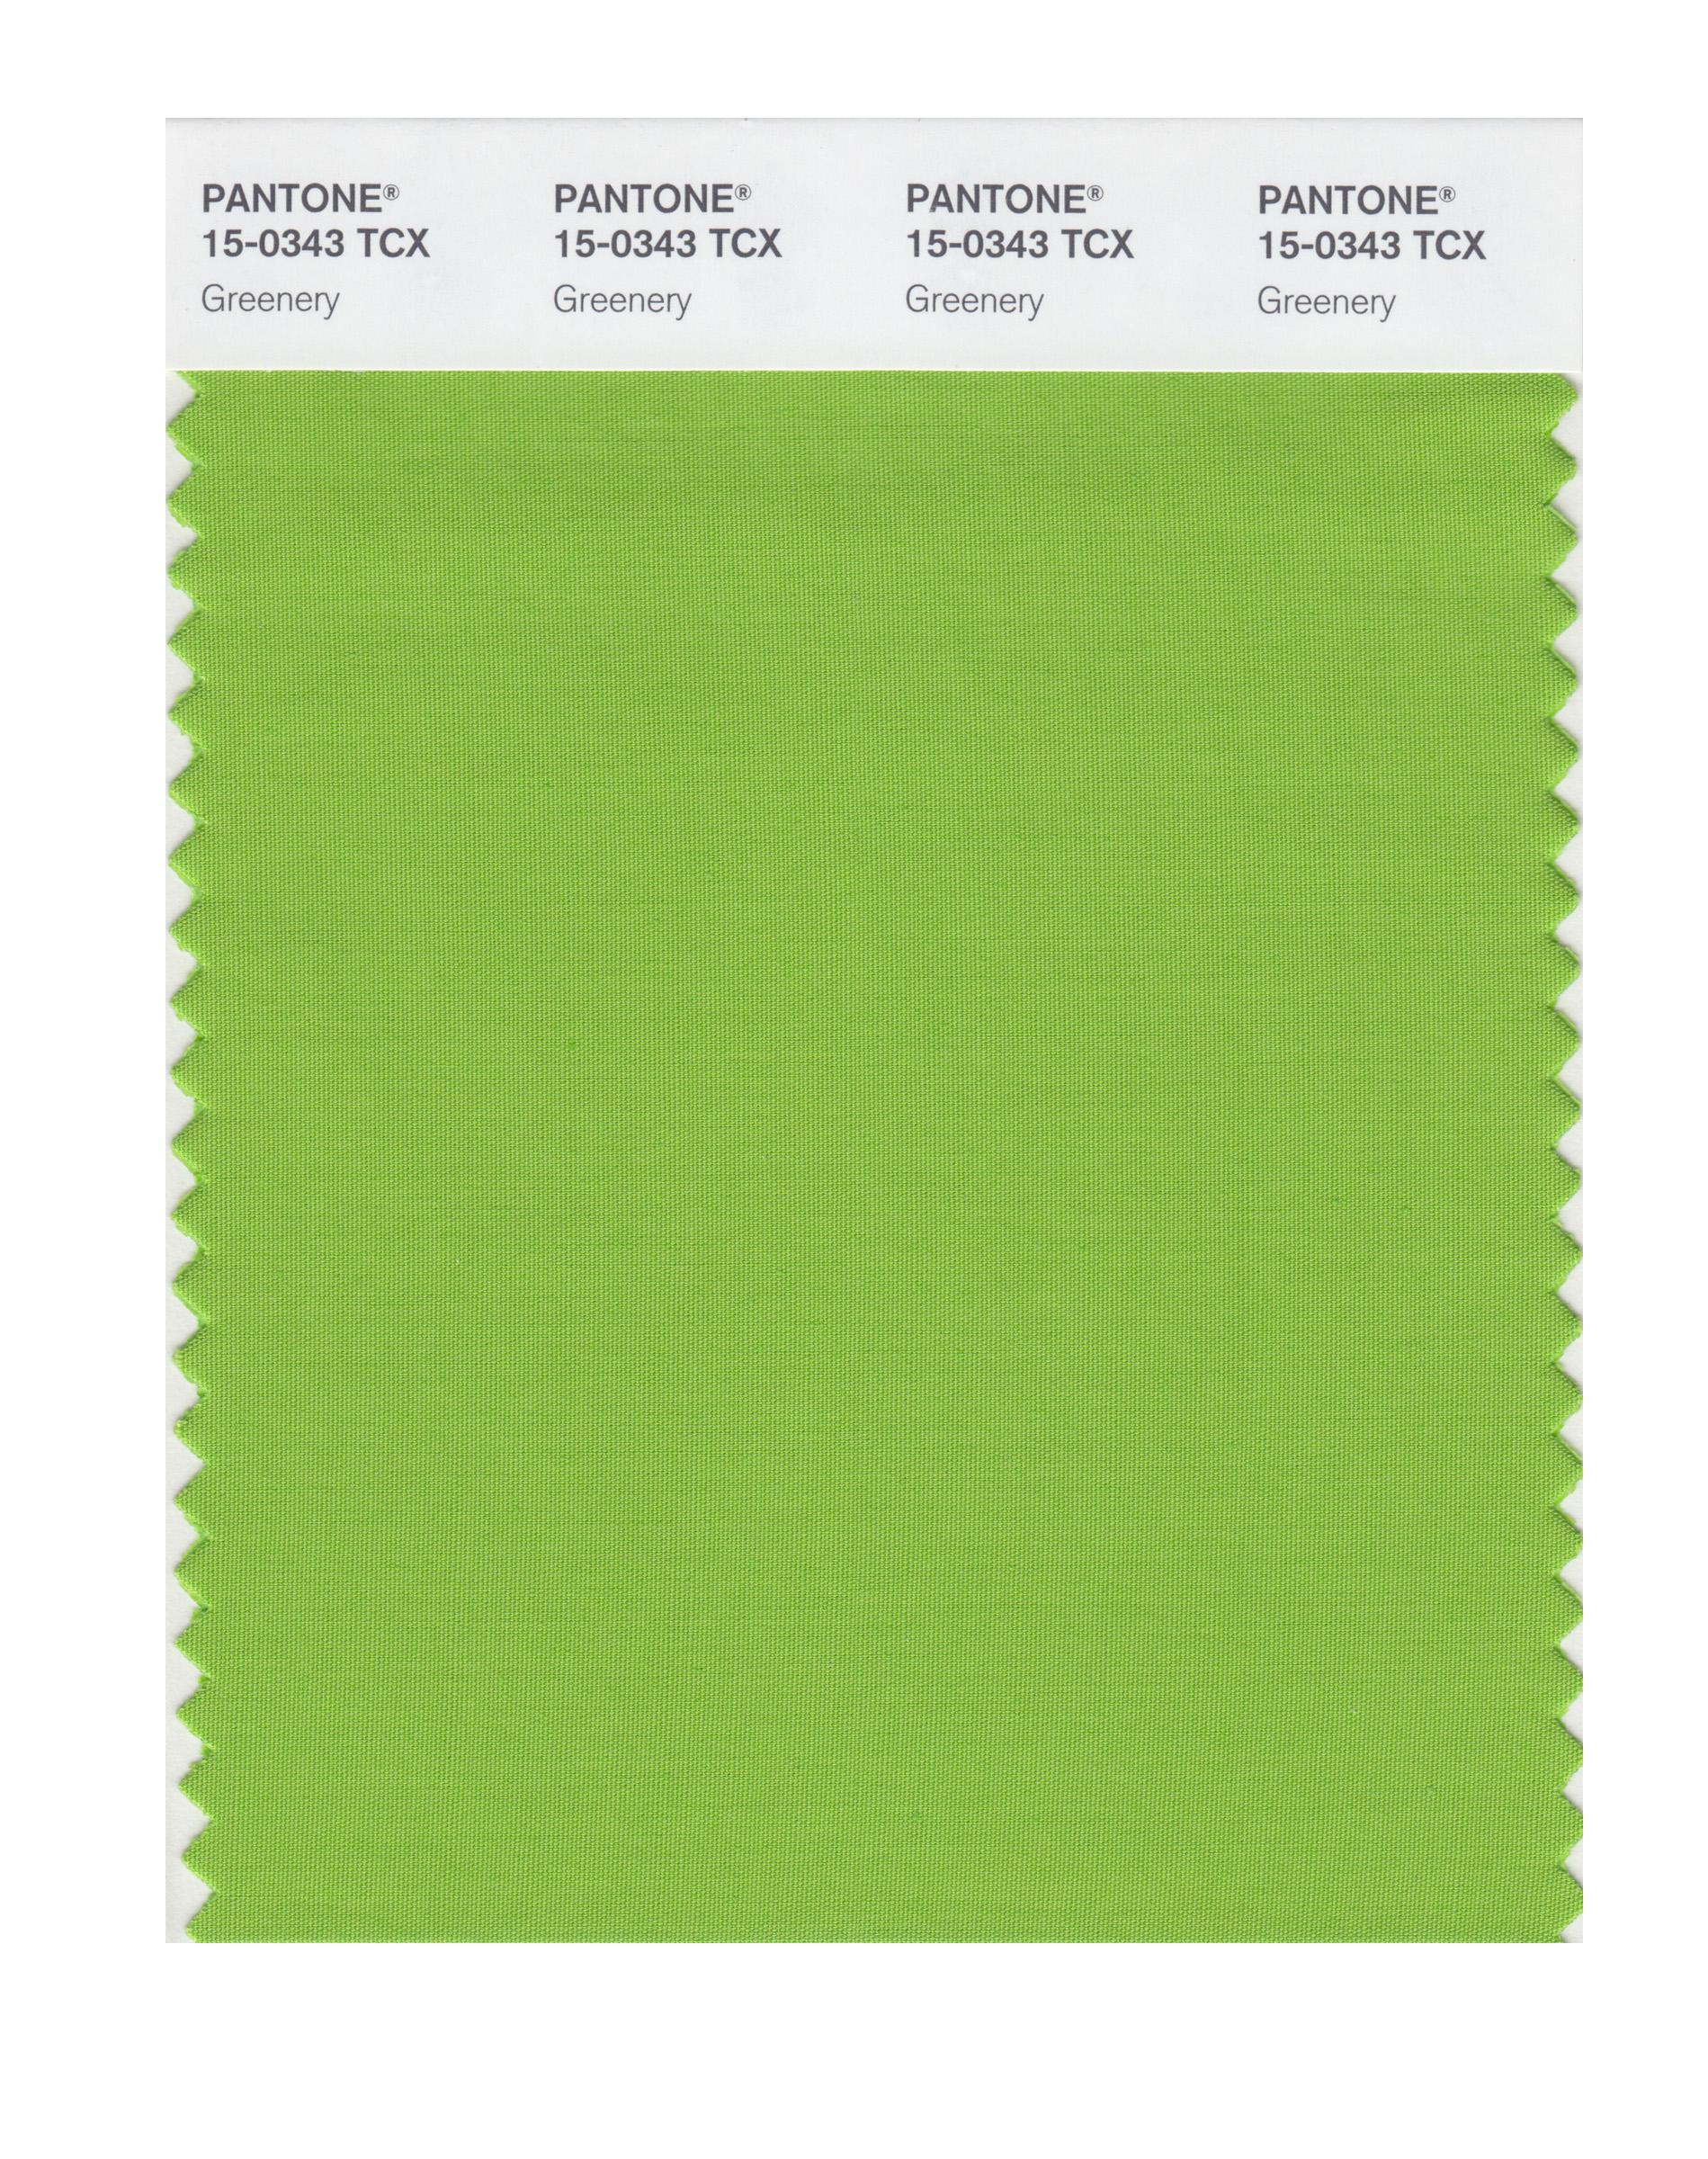 pantone-15-0343-greenery